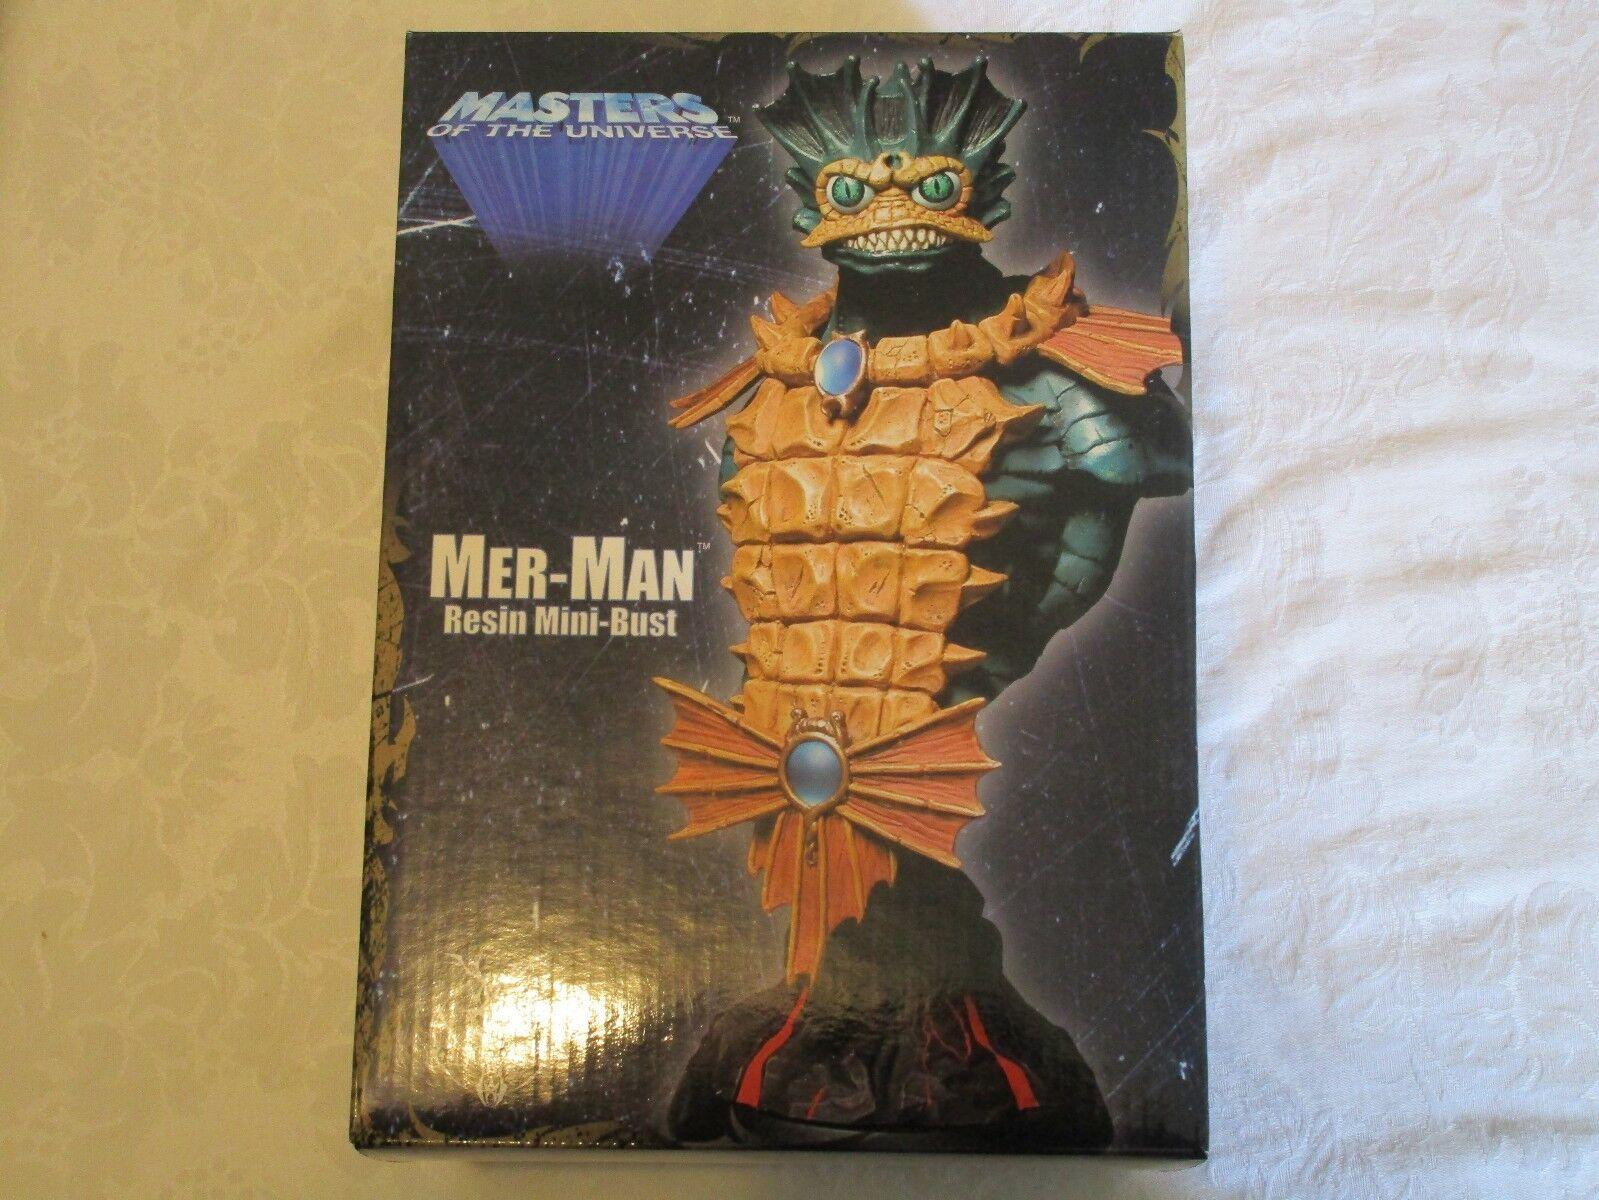 Neca Masters of the Universe MOTU Mer-Man Resin Mini-Bust  1185/2500